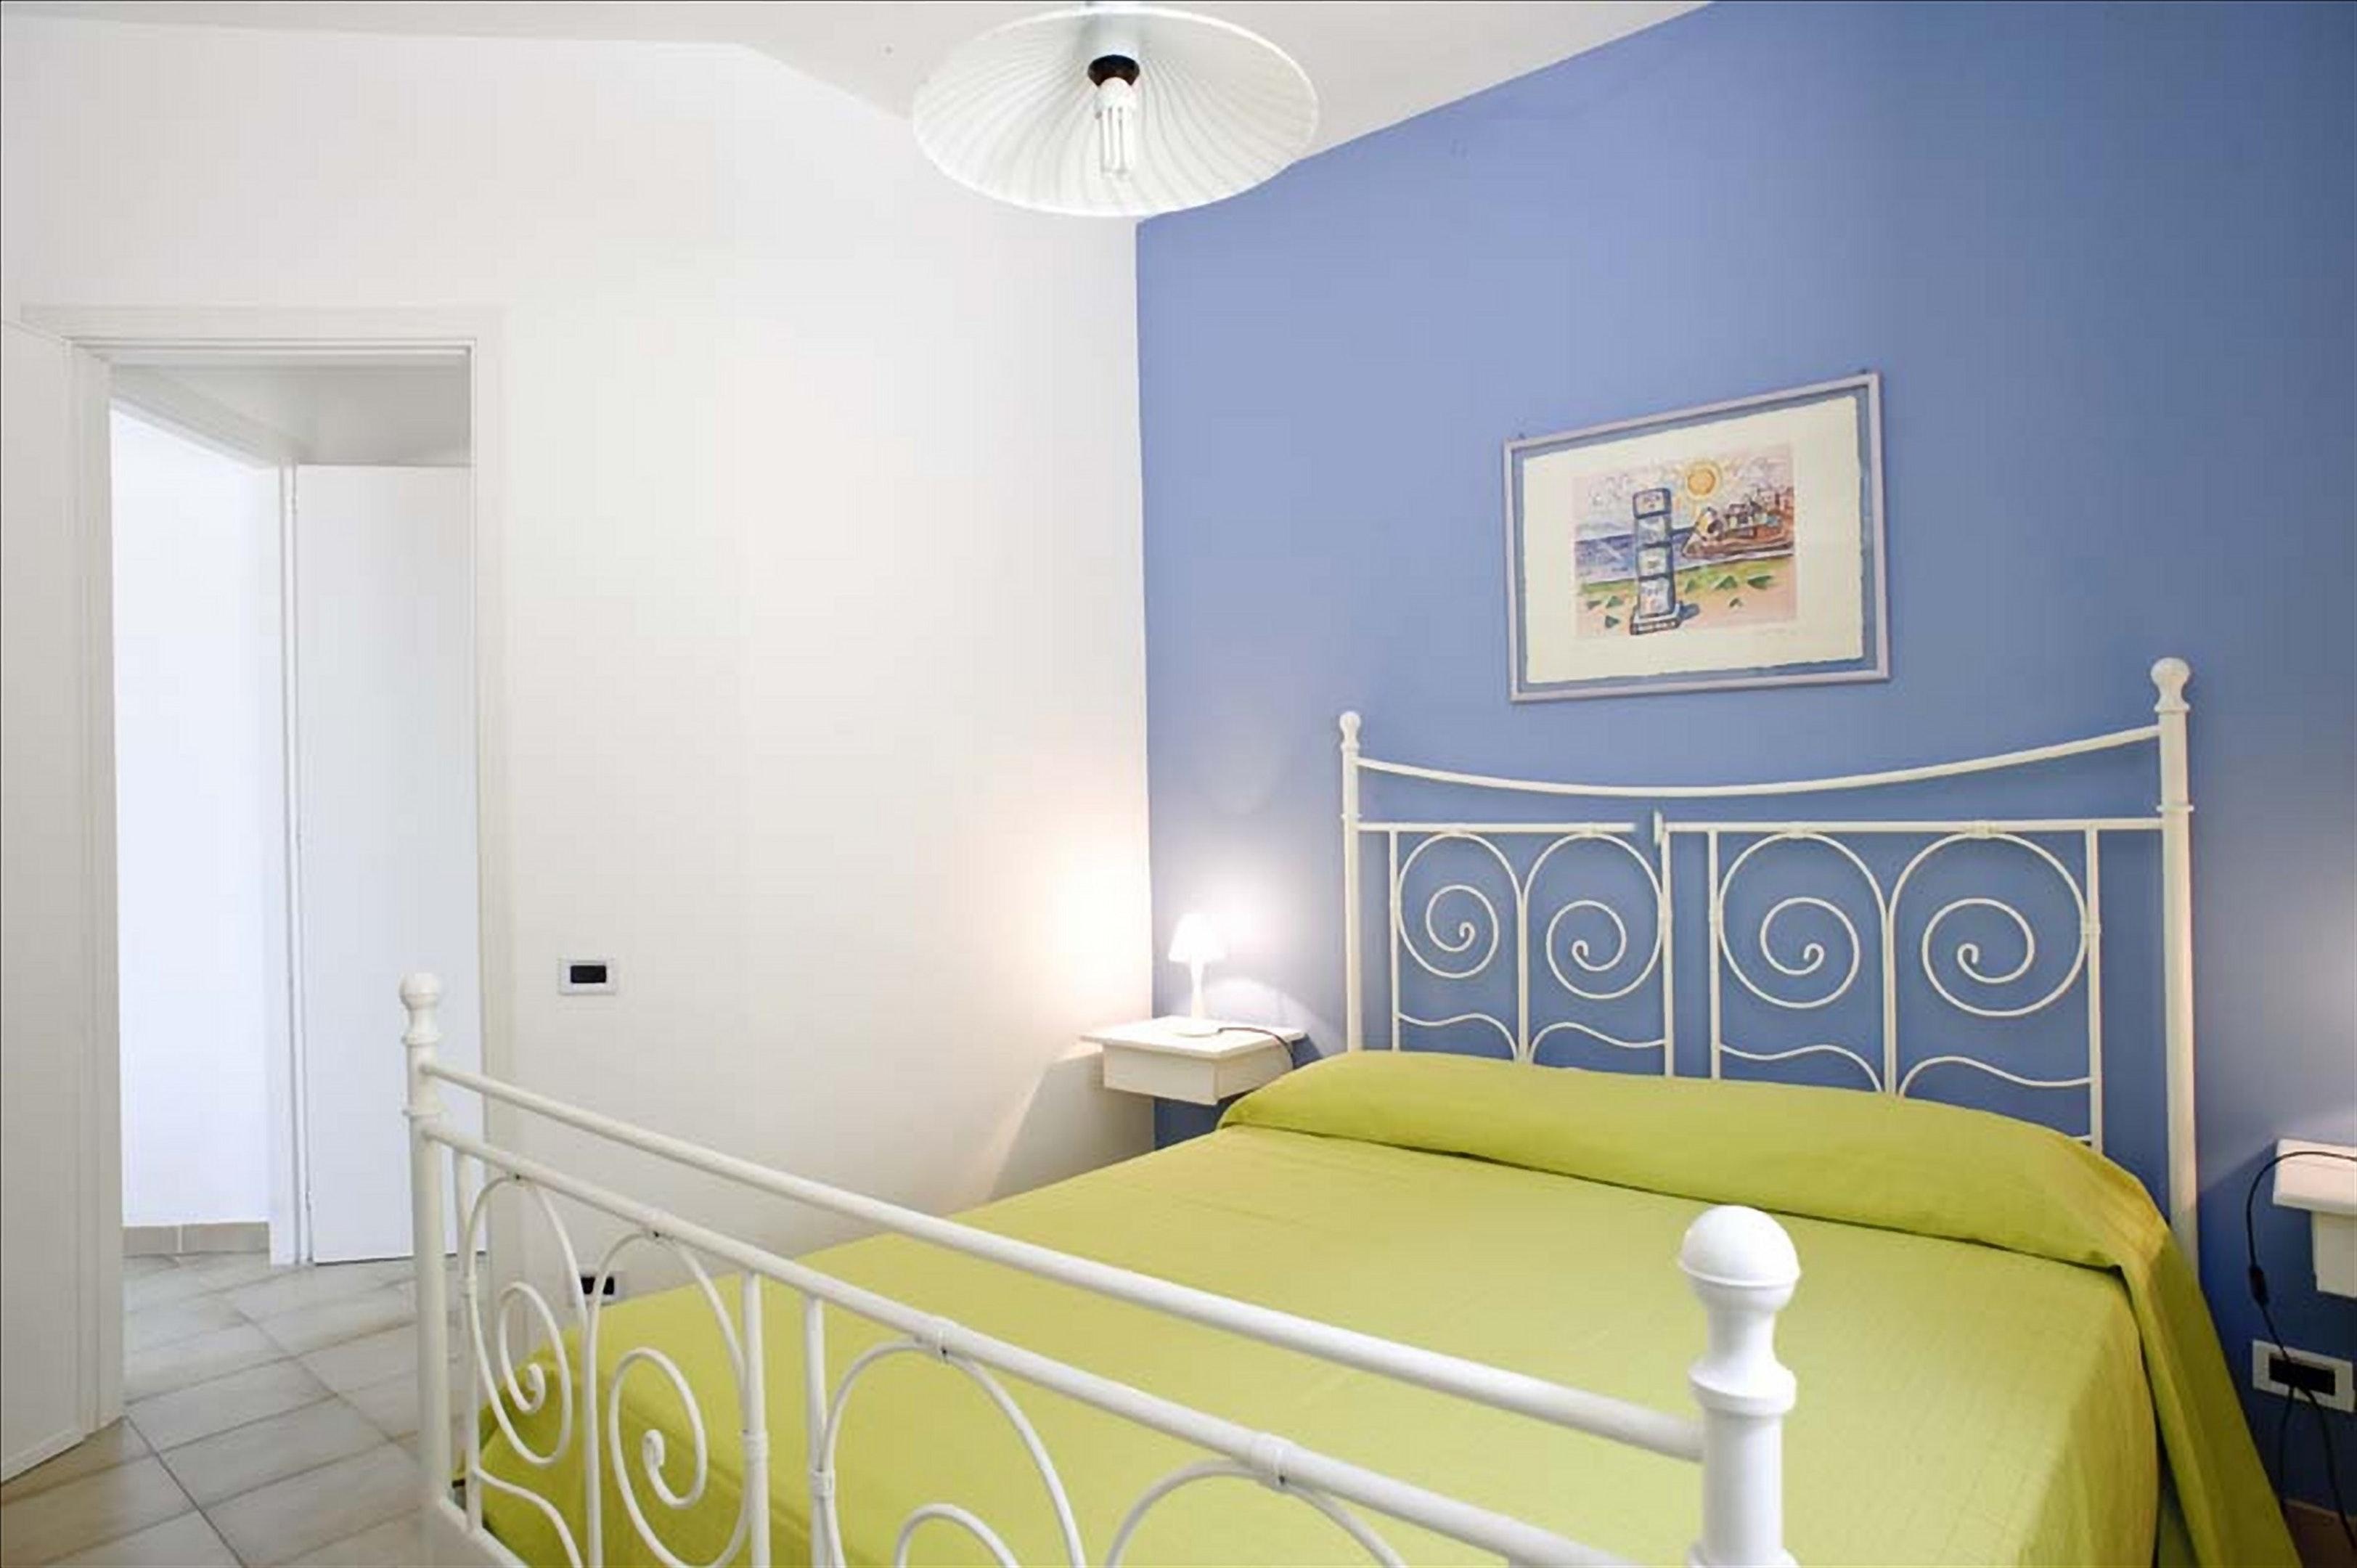 Holiday apartment Wohnung mit 3 Schlafzimmern in Piano di Trappeto mit herrlichem Meerblick, möblierter Terr (2271436), Balestrate, Palermo, Sicily, Italy, picture 15